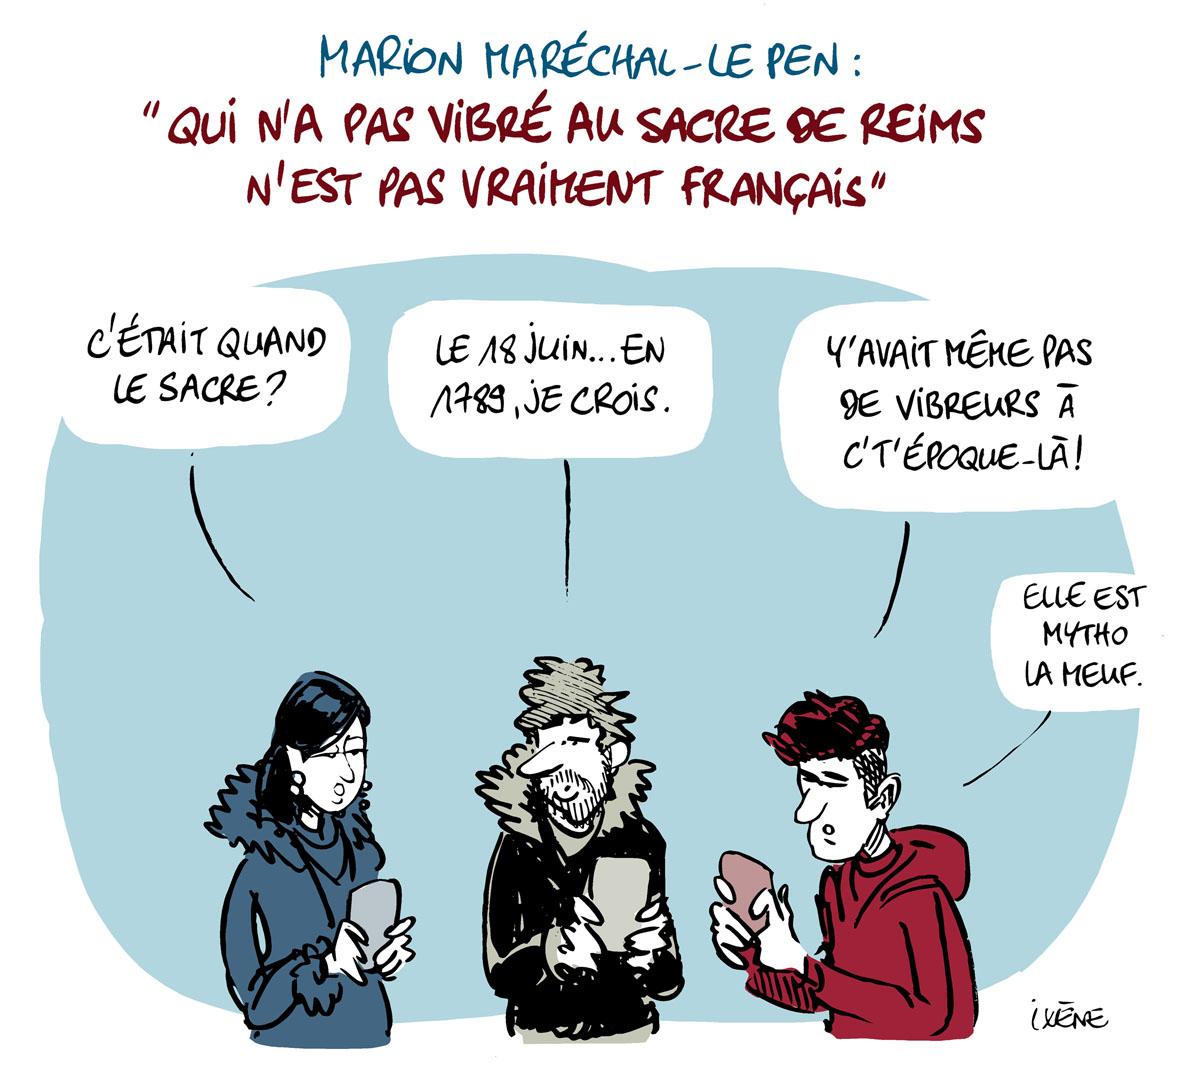 Ixene_Marion-Maréchal-LePen-Reims